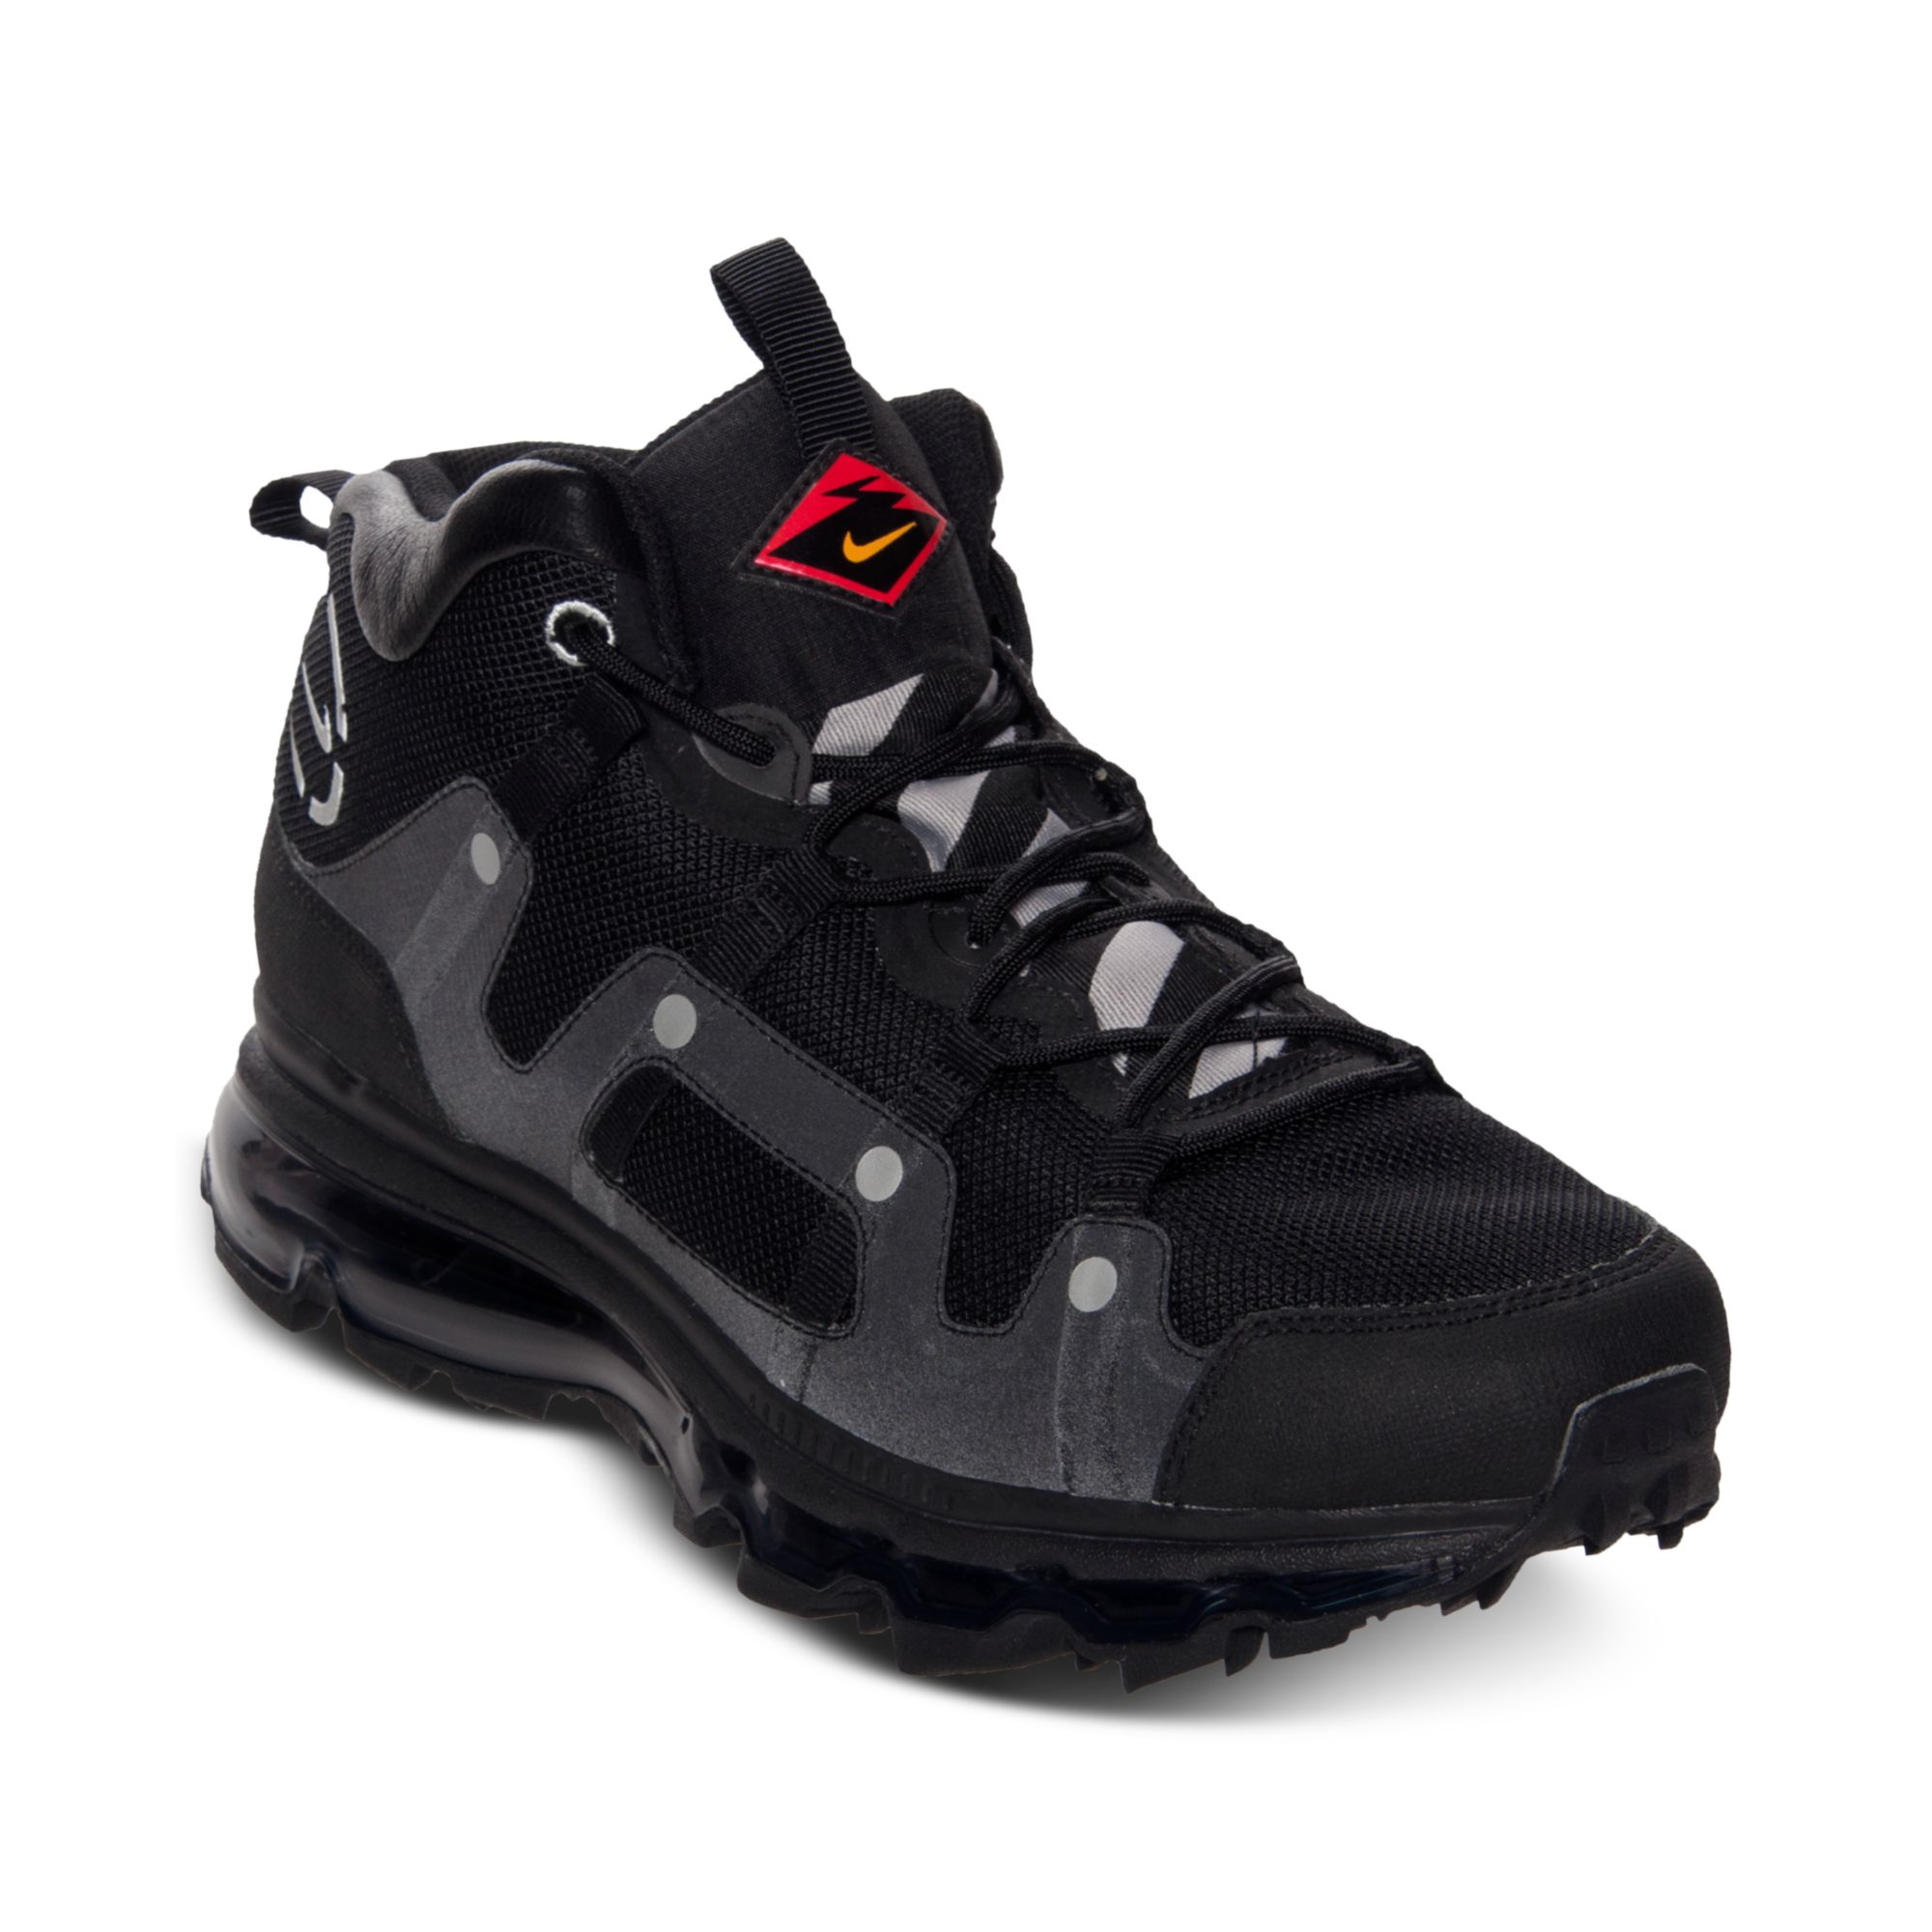 Air Jordan Steel Toe Shoes